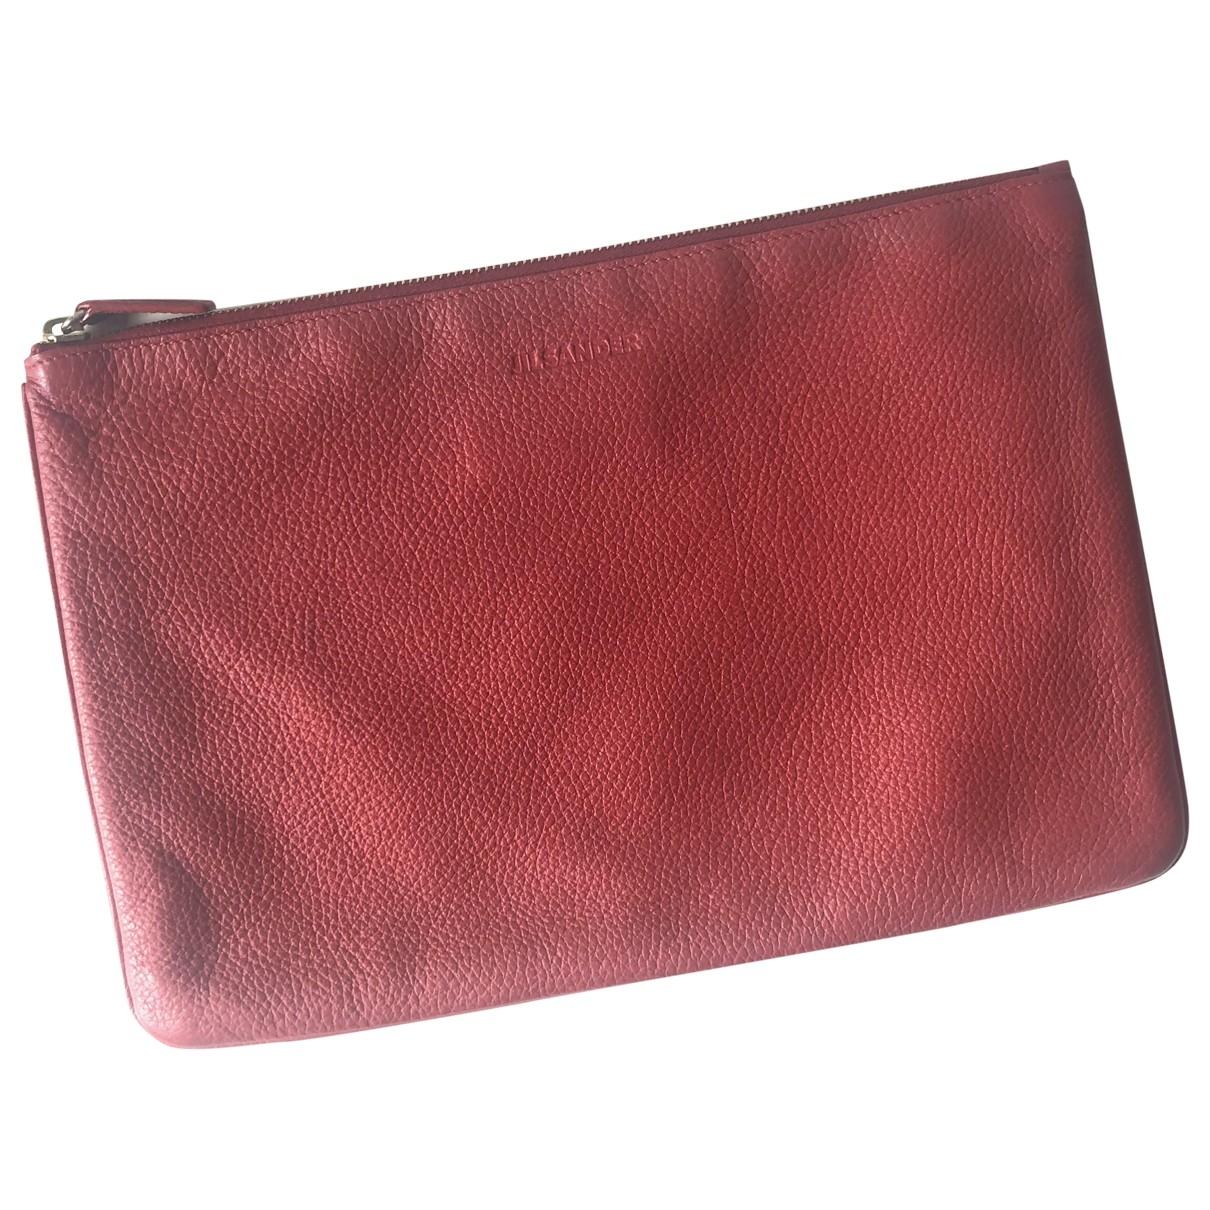 Jil Sander \N Red Leather Clutch bag for Women \N